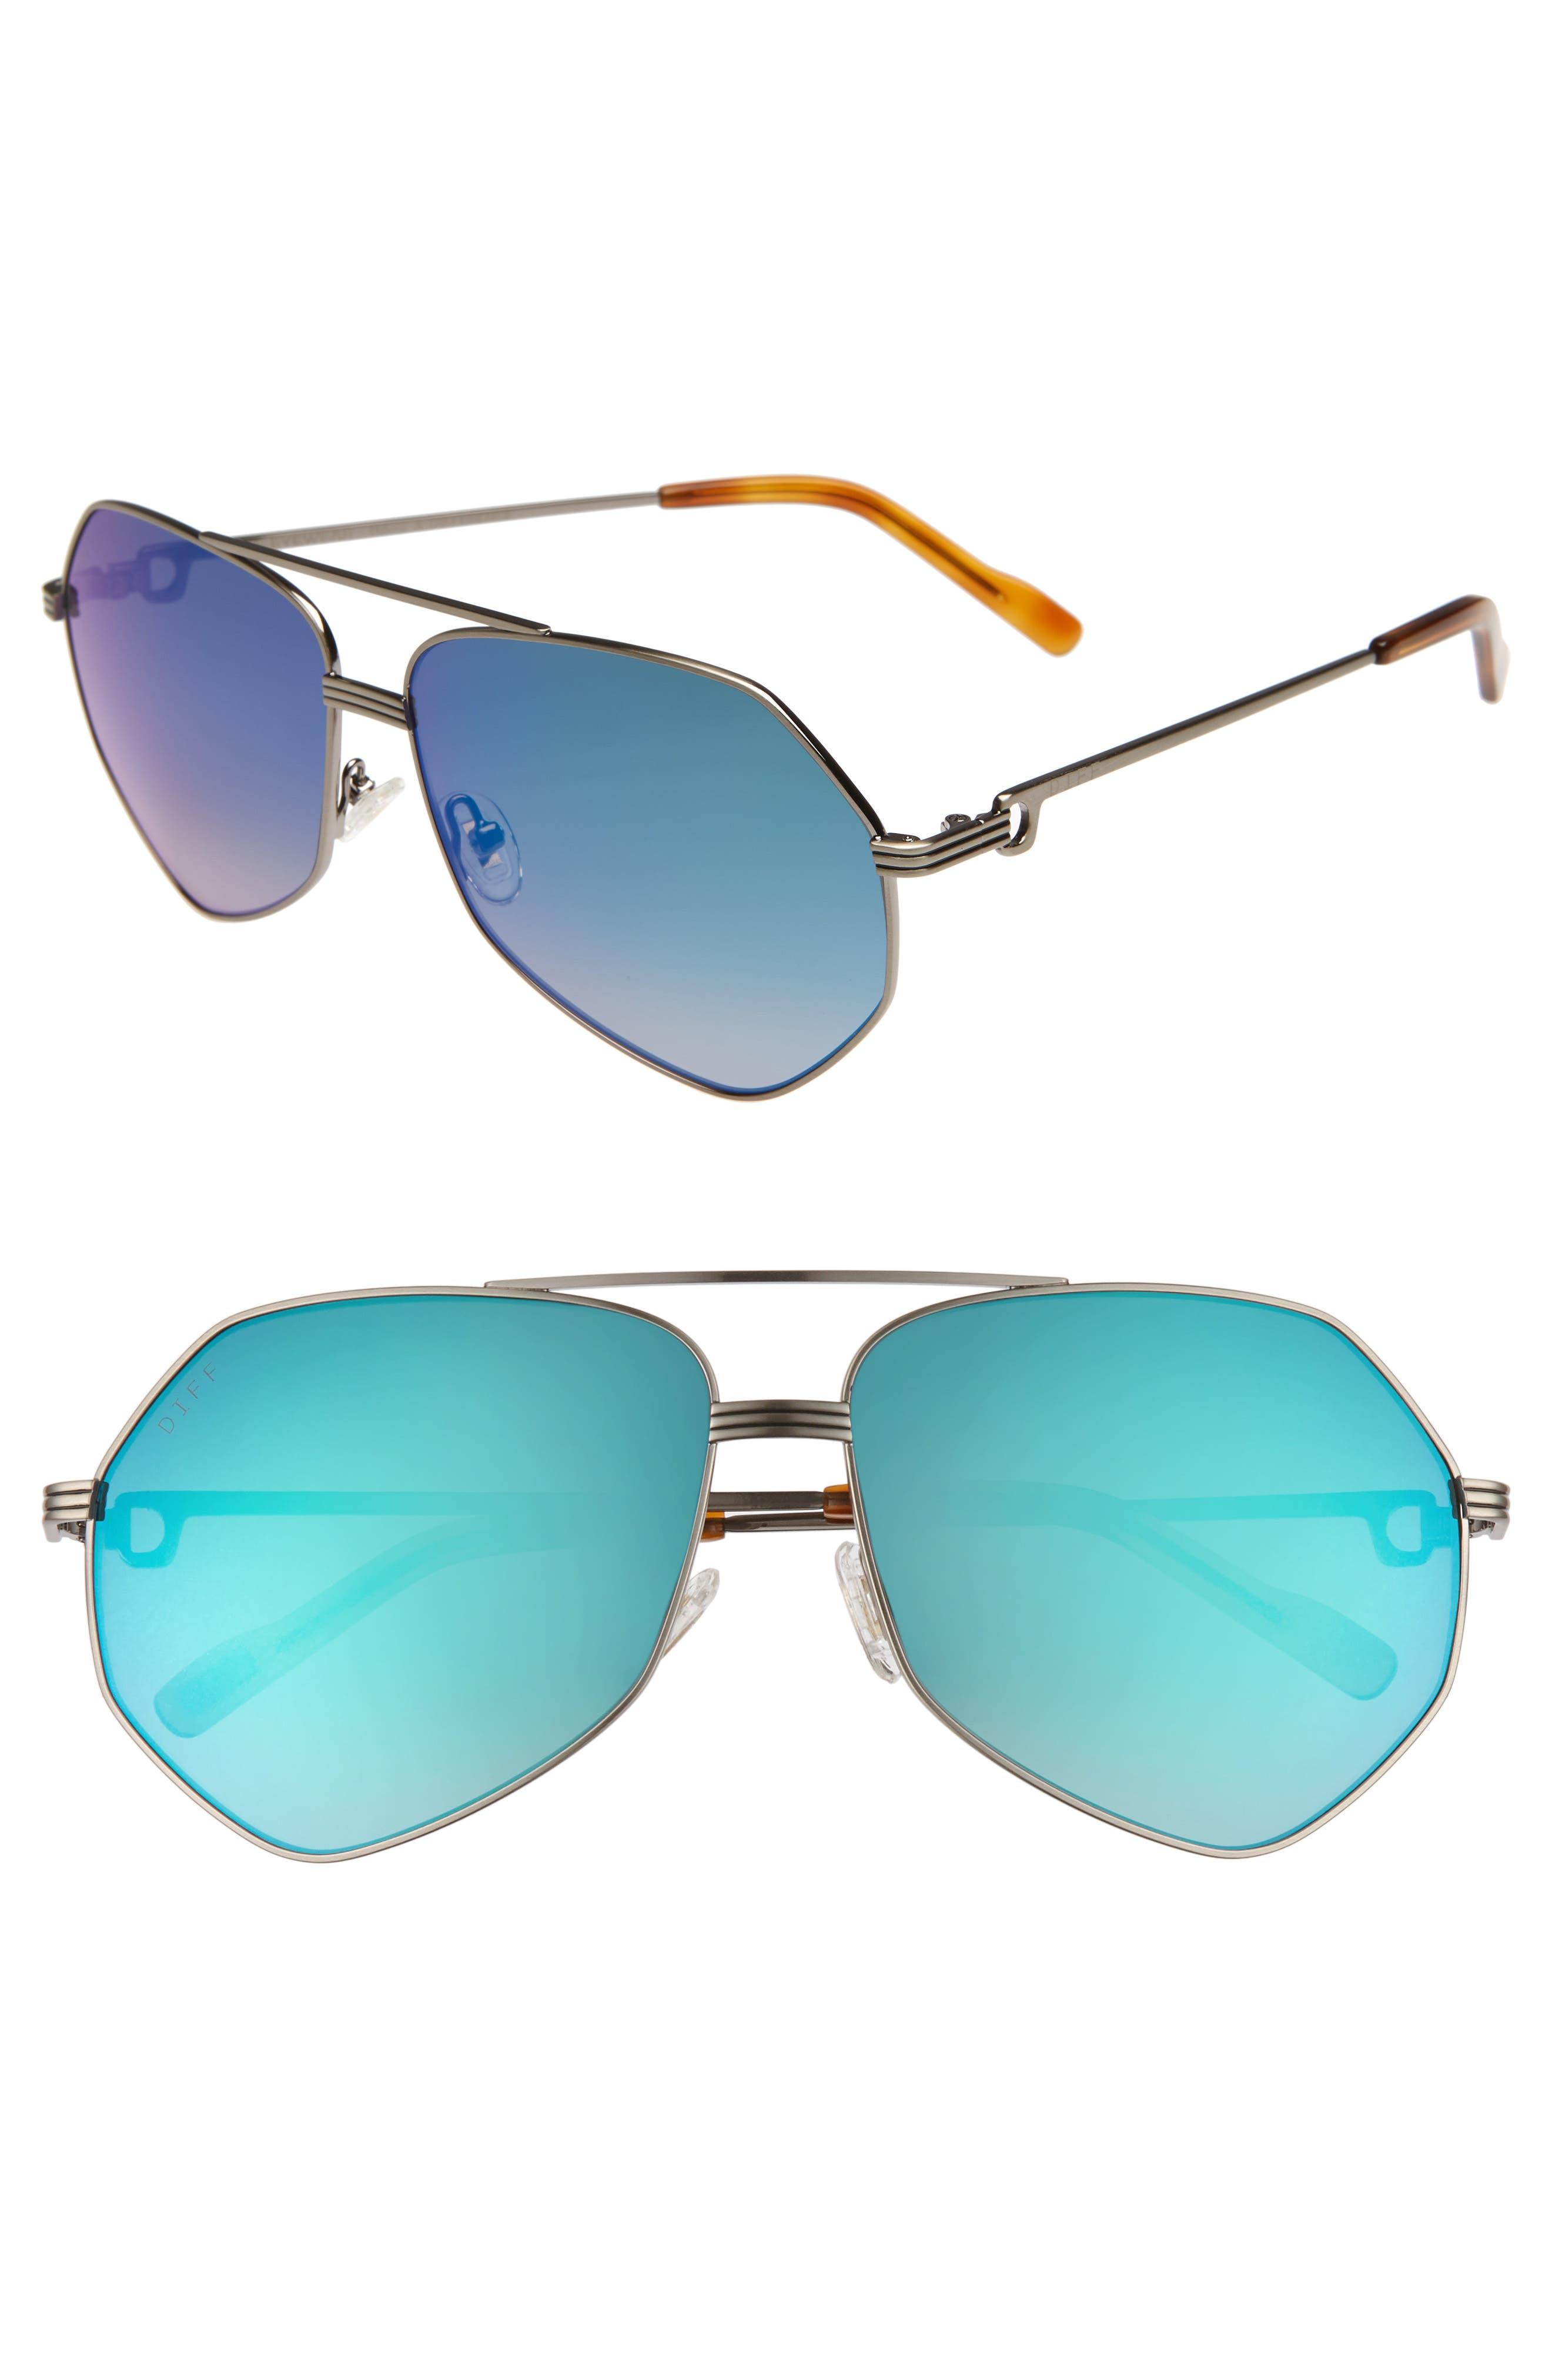 Sidney Geo Aviator Sunglasses,                             Main thumbnail 1, color,                             LIGHT GUNMETAL/ HONEY/ BLUE